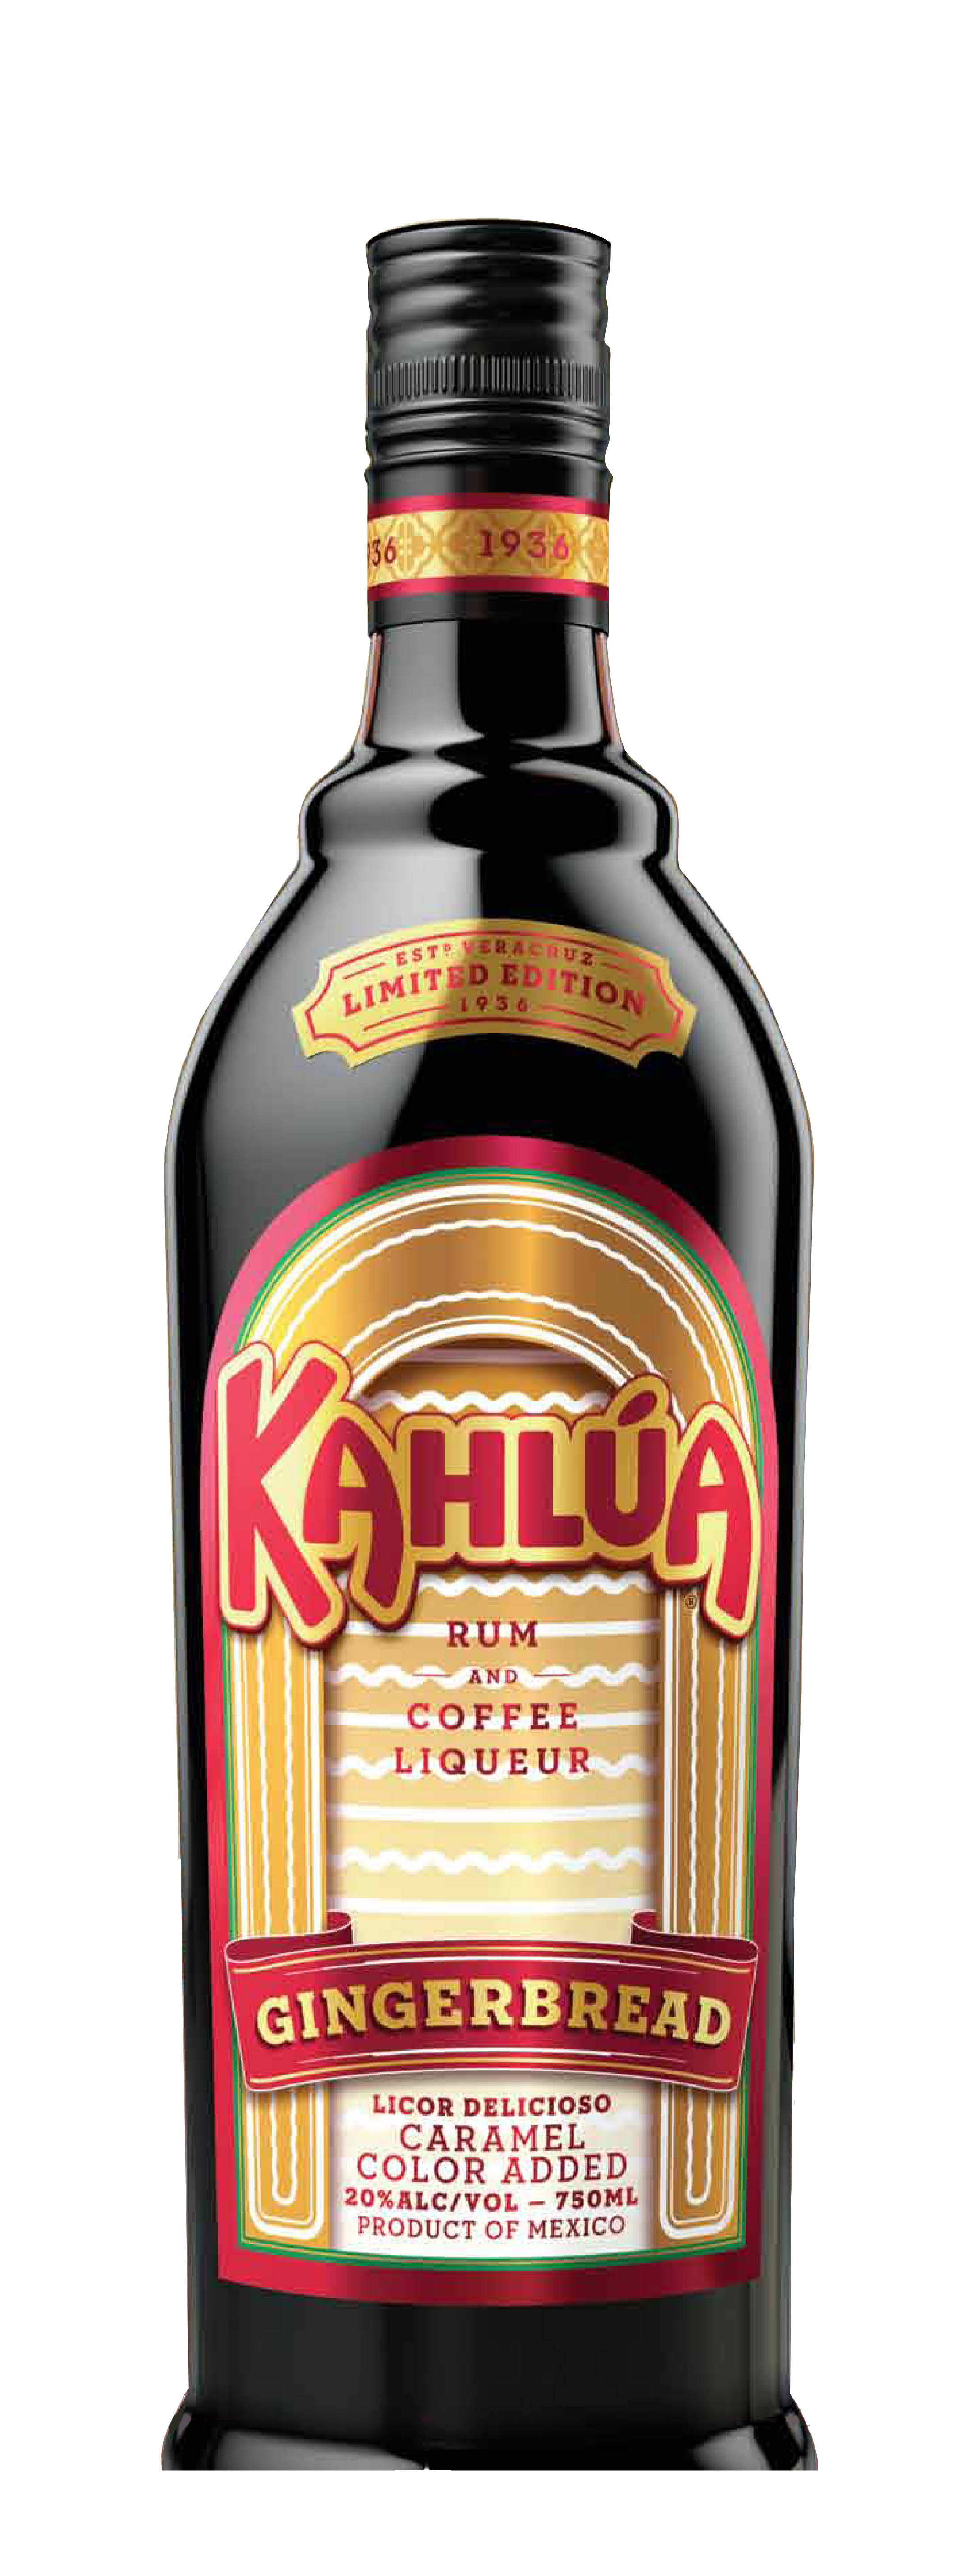 Kahlua Gingerbread Liqueur